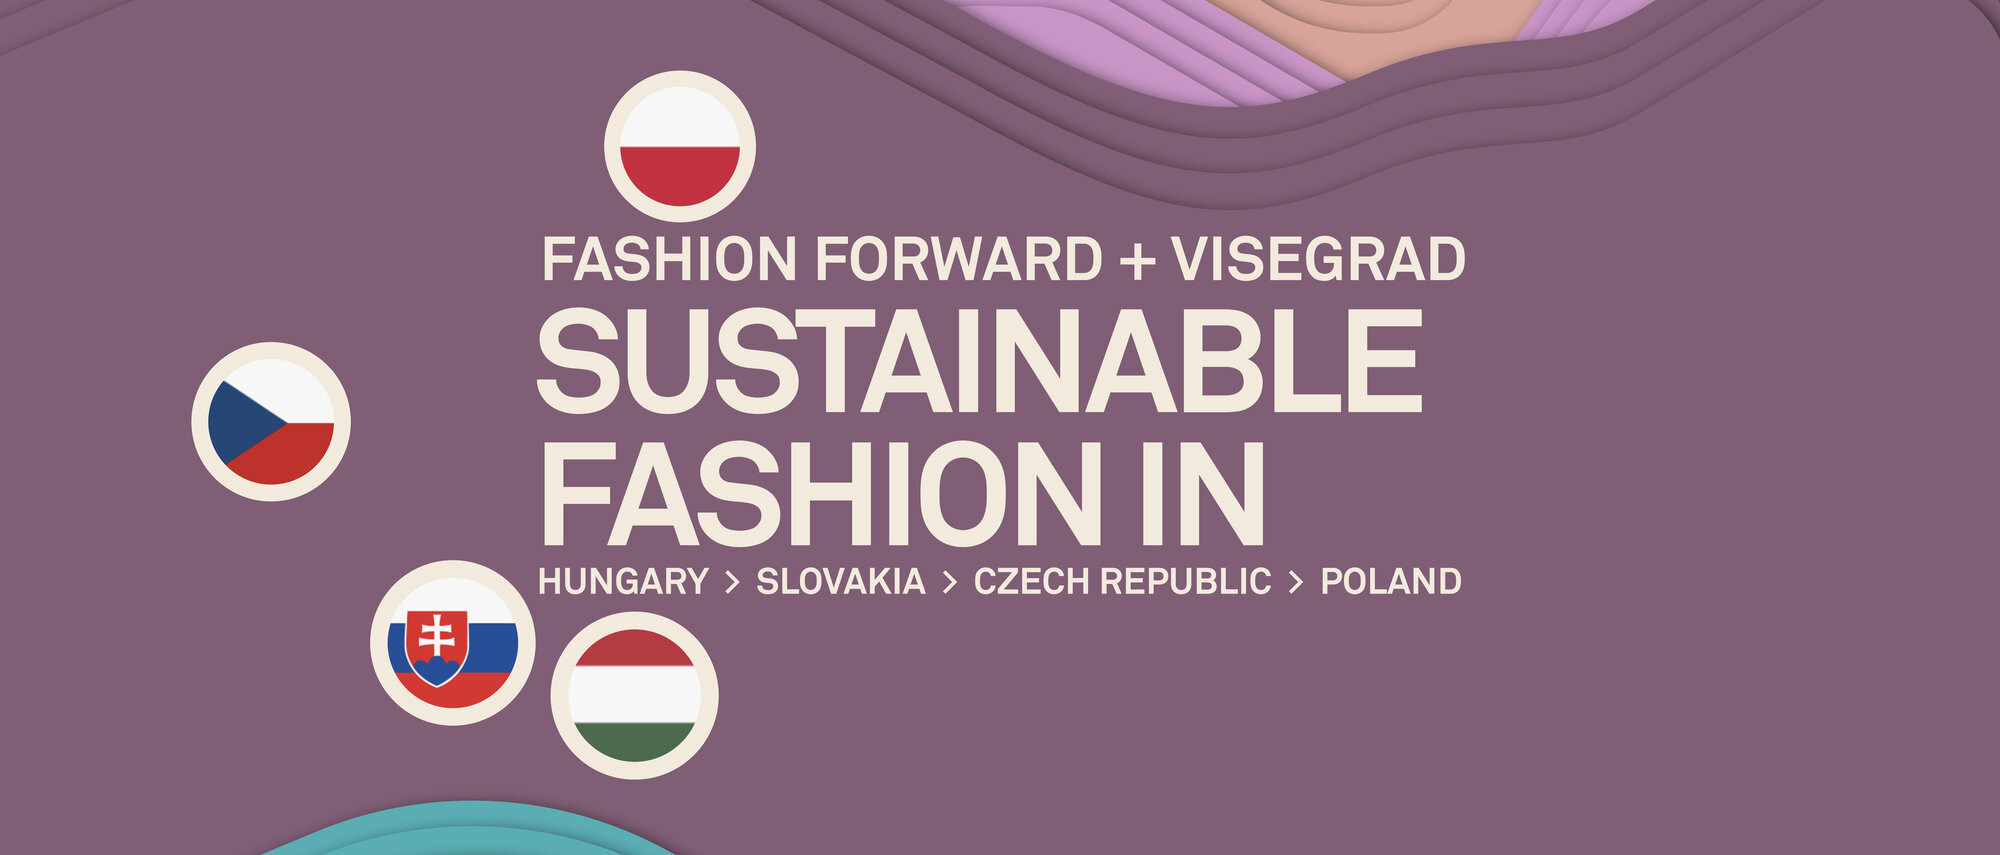 Fashion Forward Visegrad